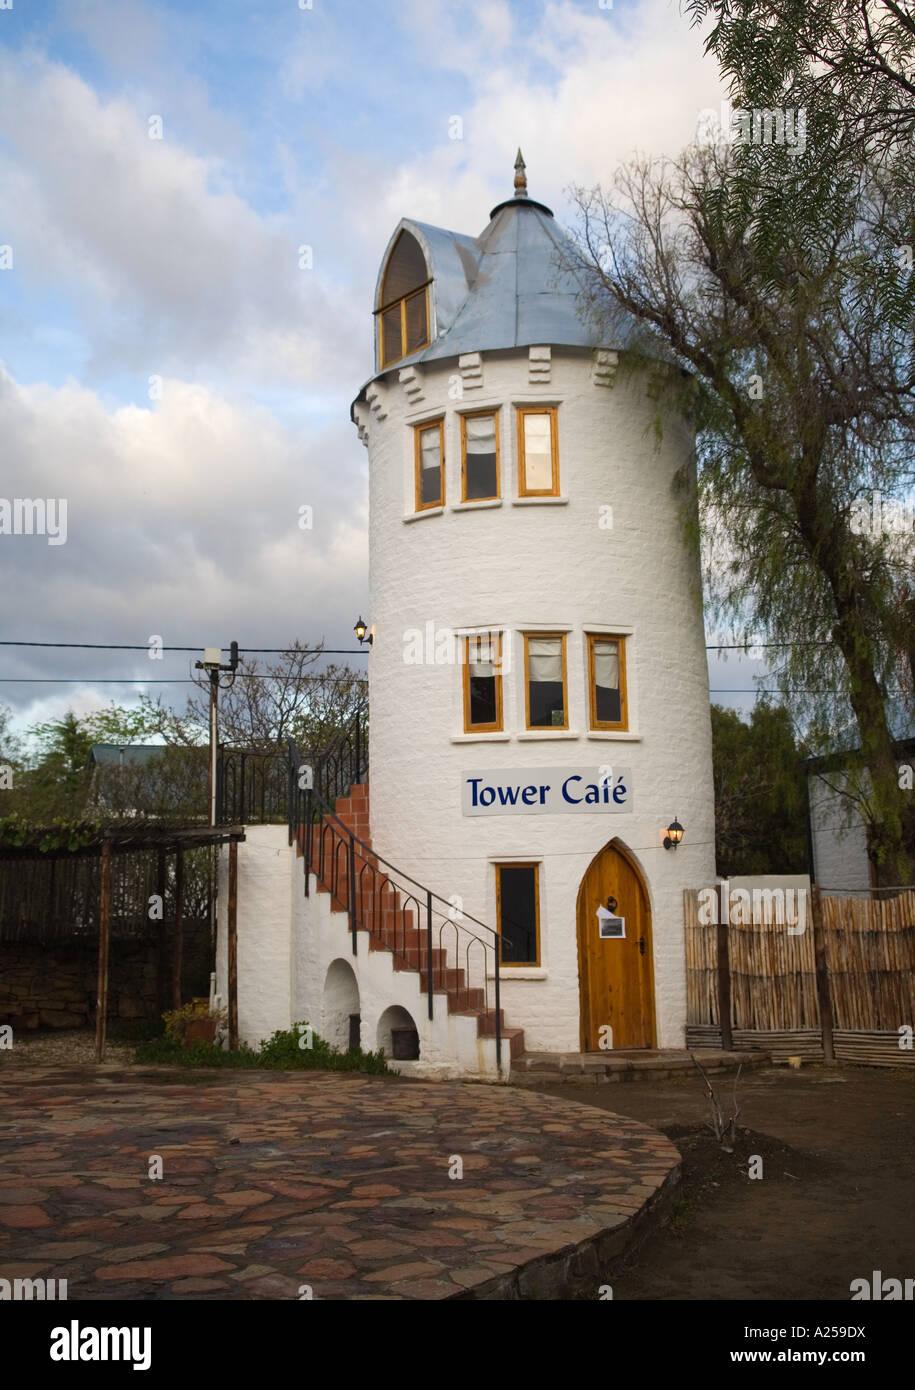 tower cafe in nieu bethesda Stock Photo: 10411573 - Alamy